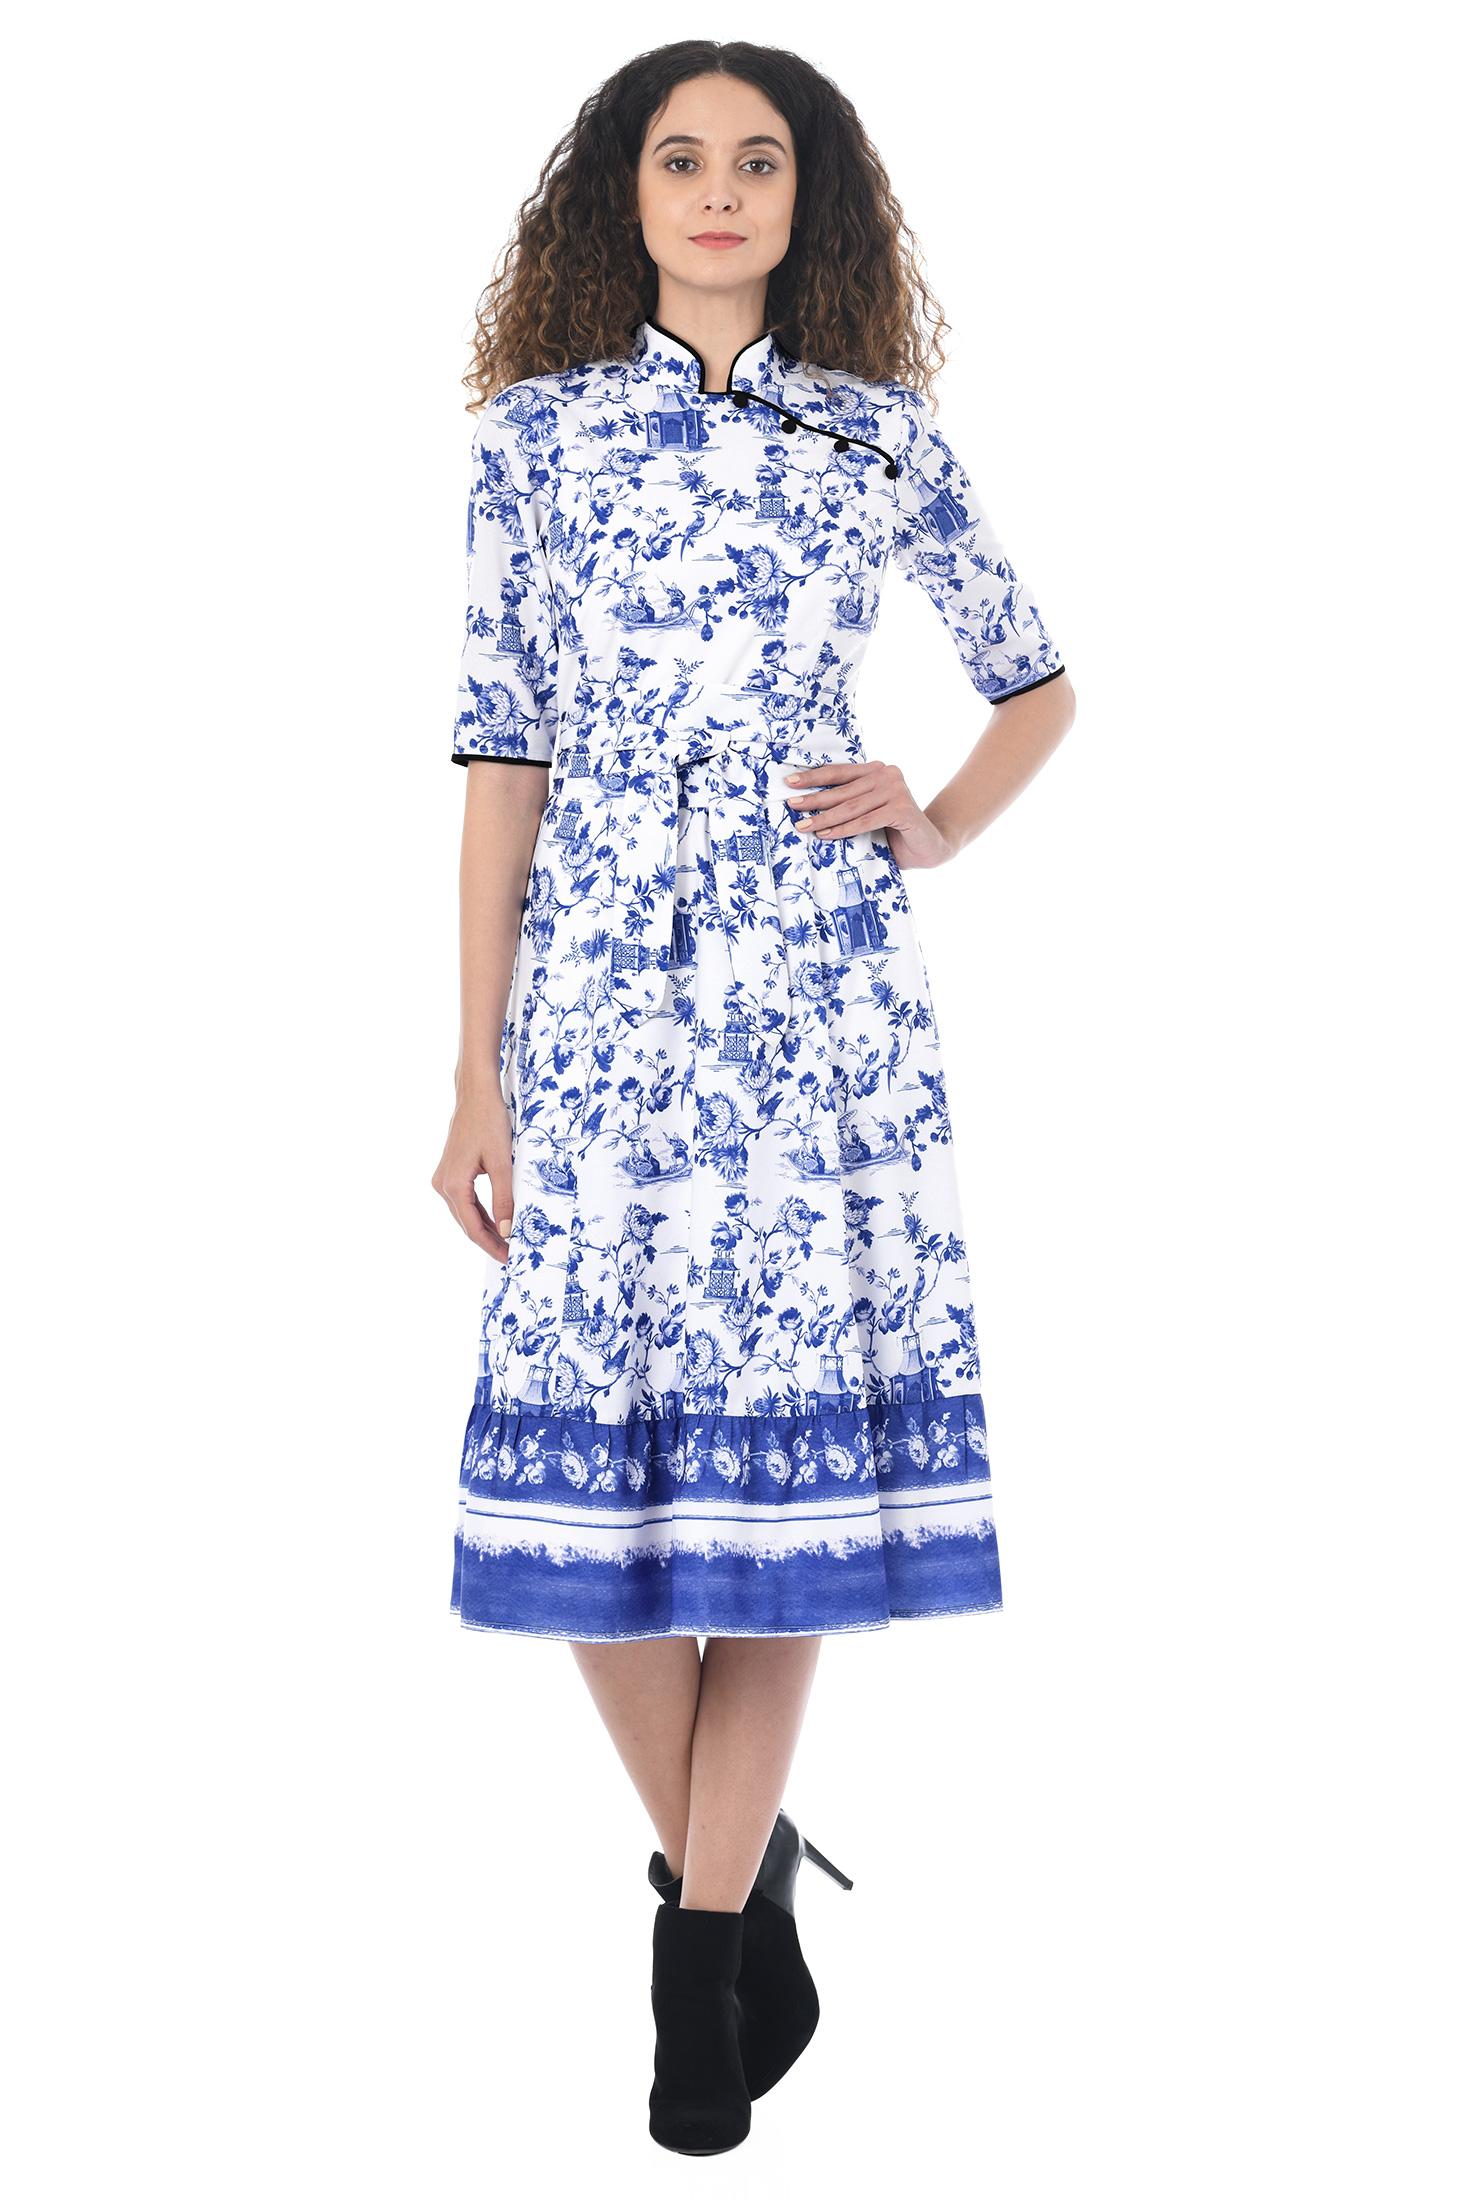 Eshakti Womens Mandarin Collar Porcelain Print Crepe Dress